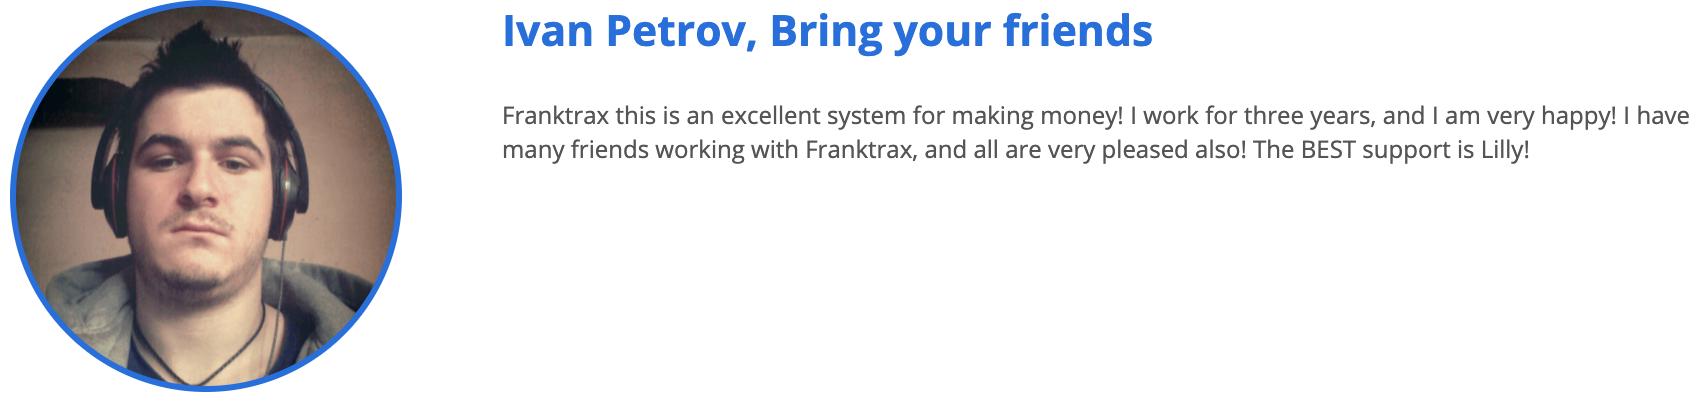 Franktrax Testimonial